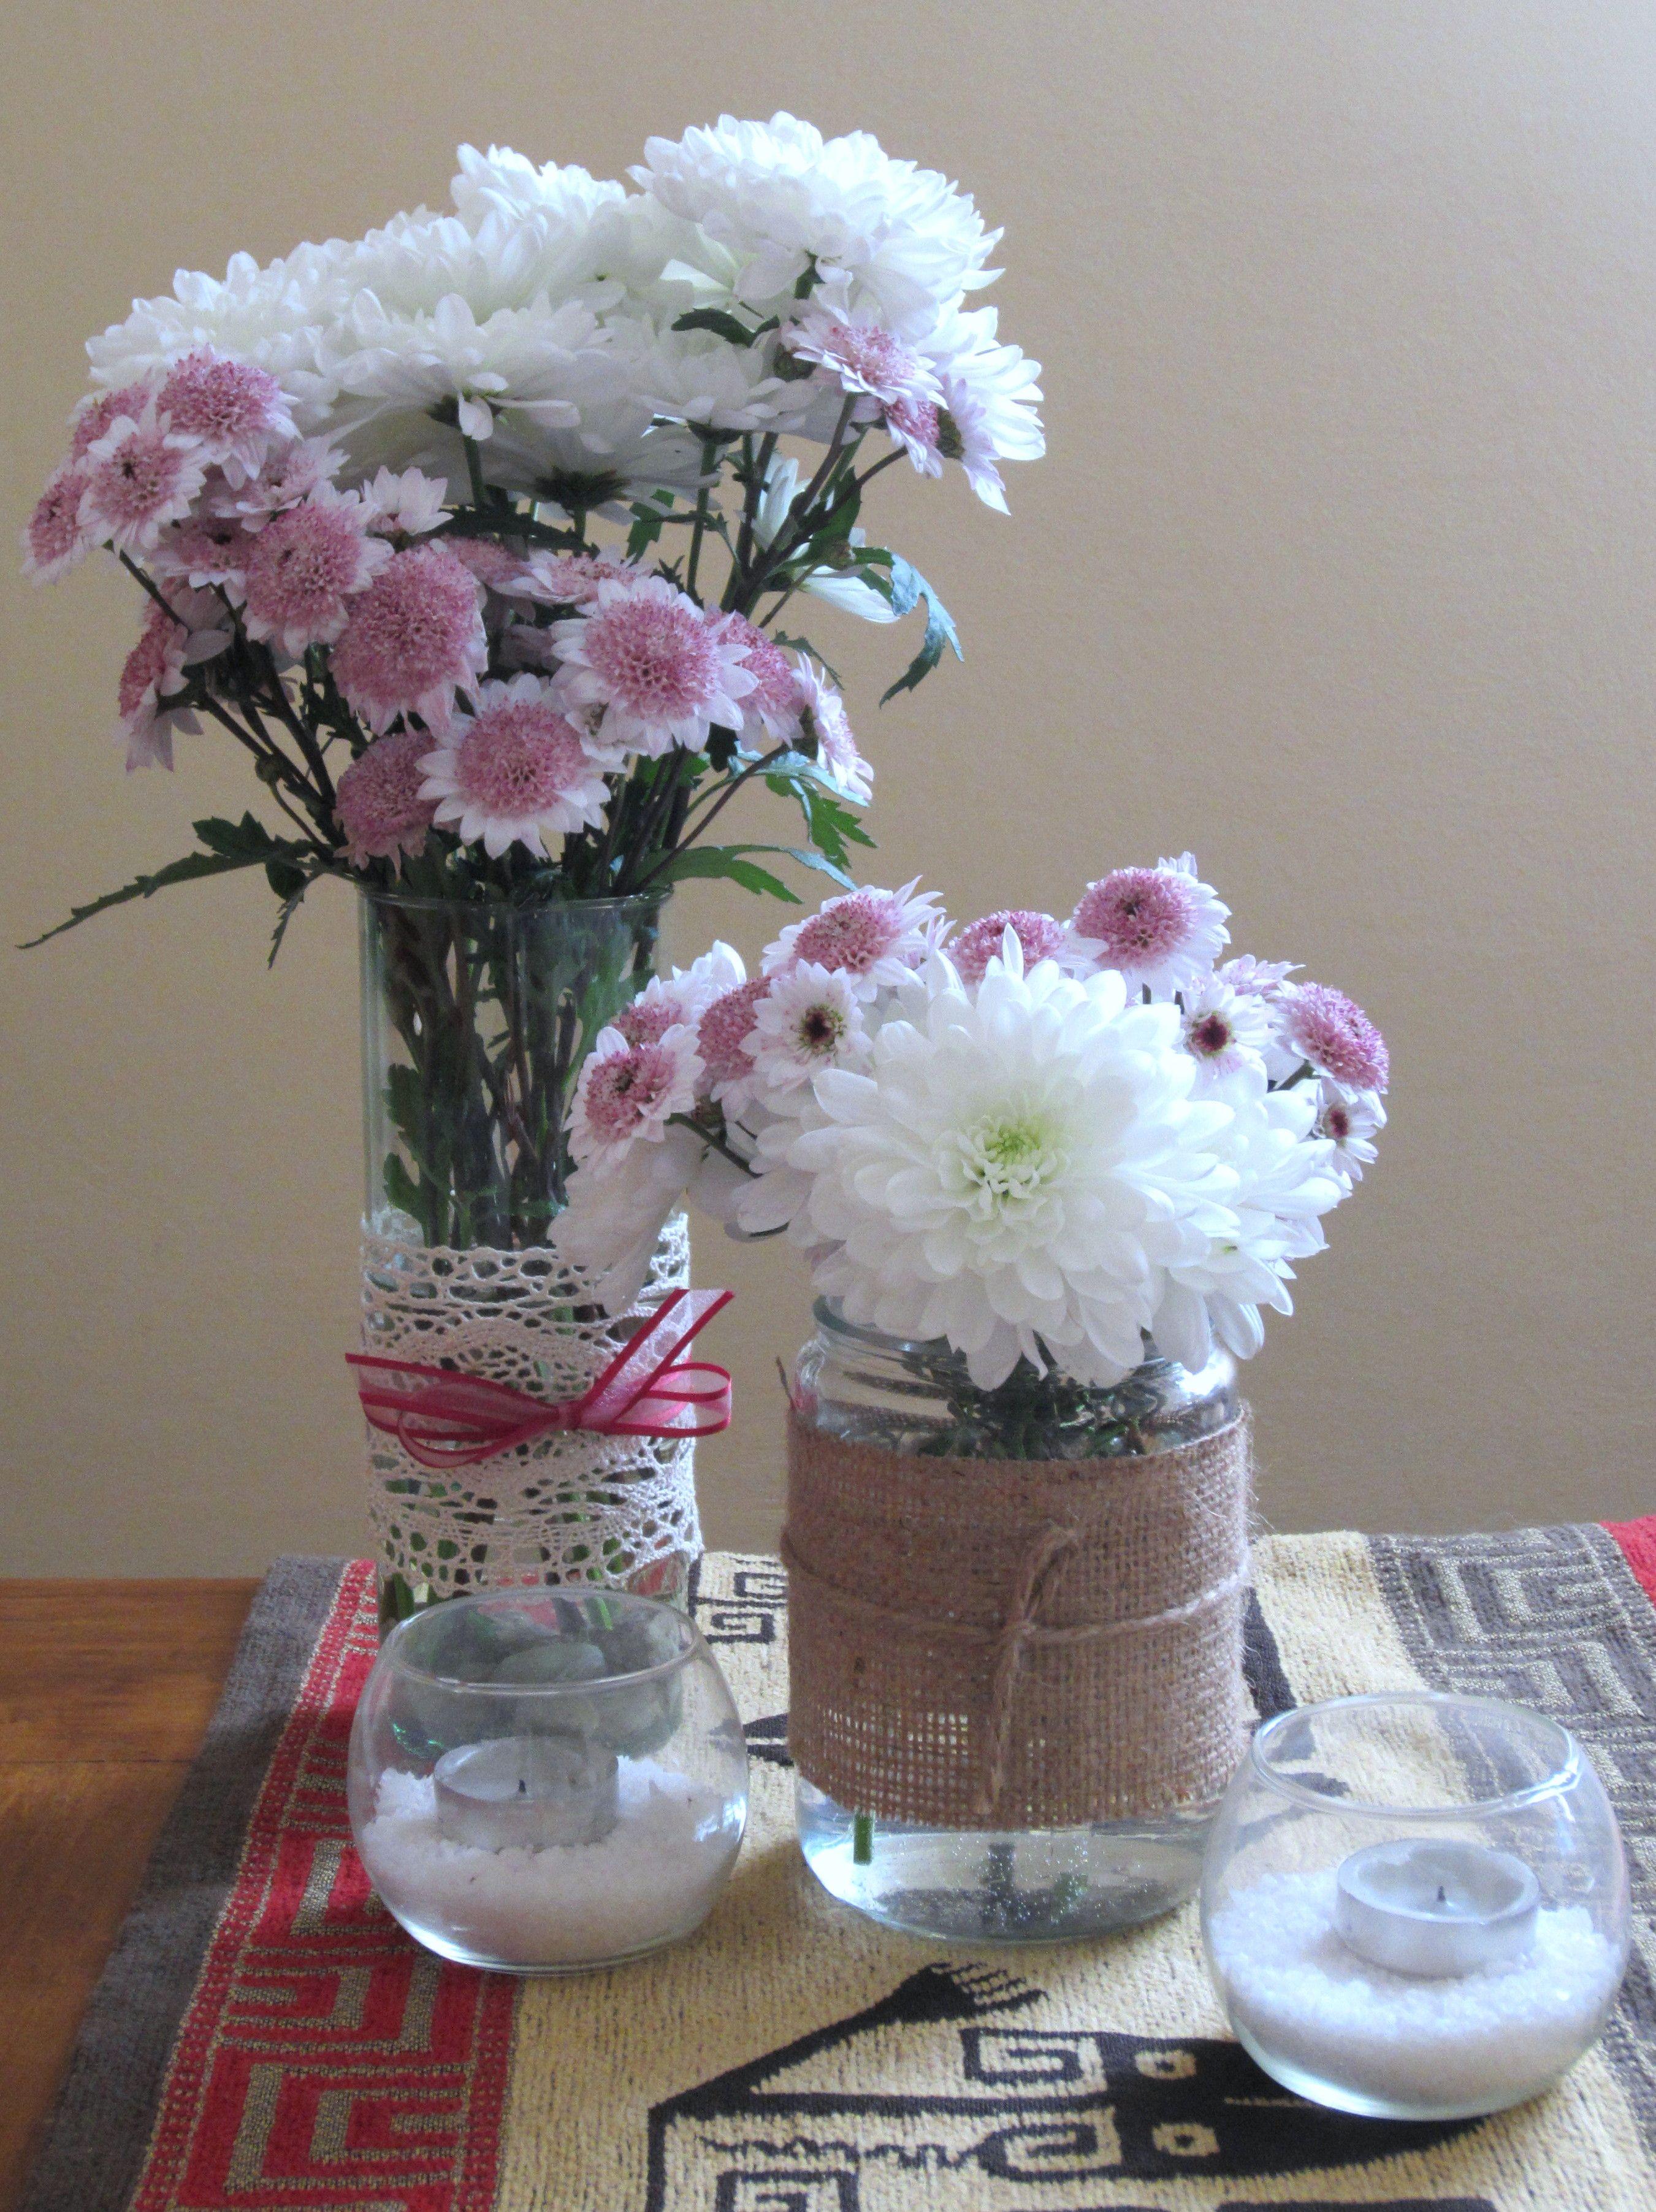 Centro de mesa con frascos flores naturales y velas - Centros d mesa ...